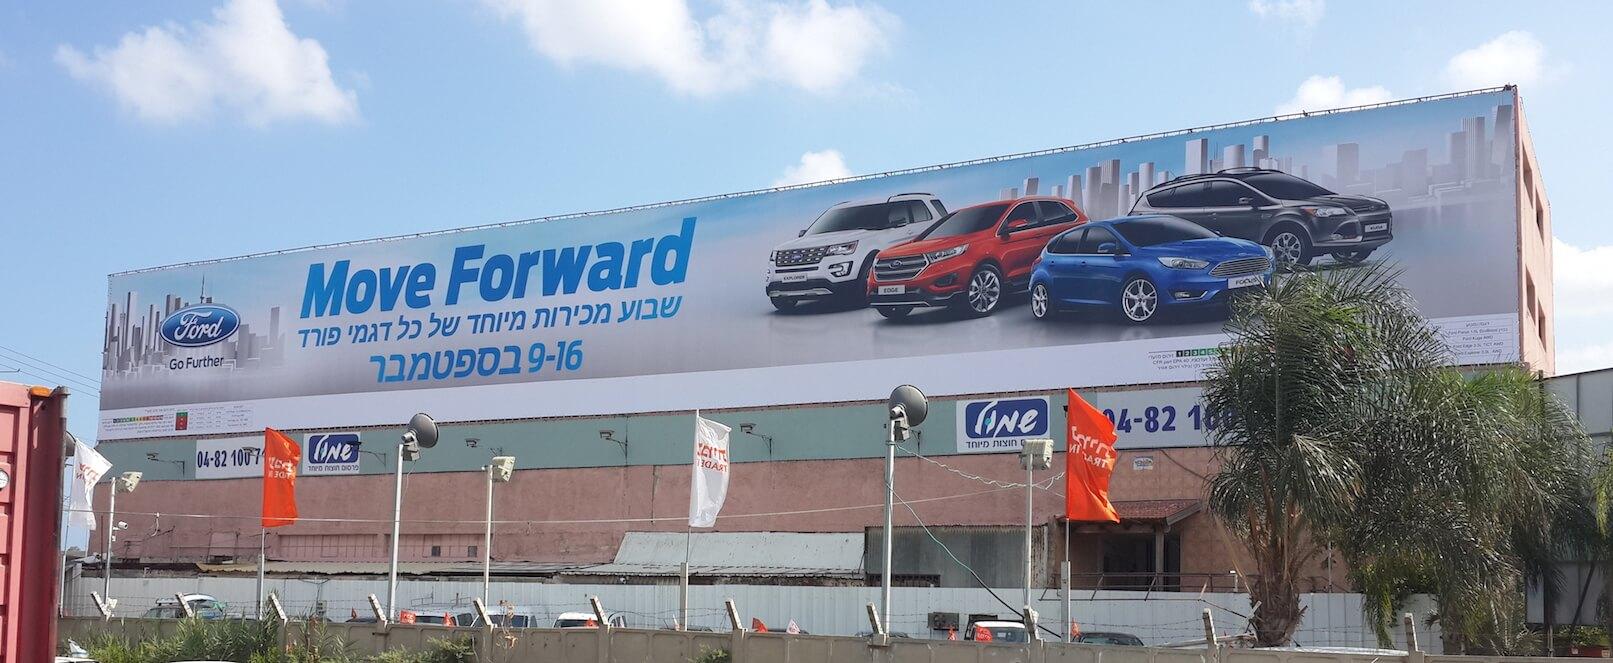 Монтаж баннера 50x6 метров. Haifa